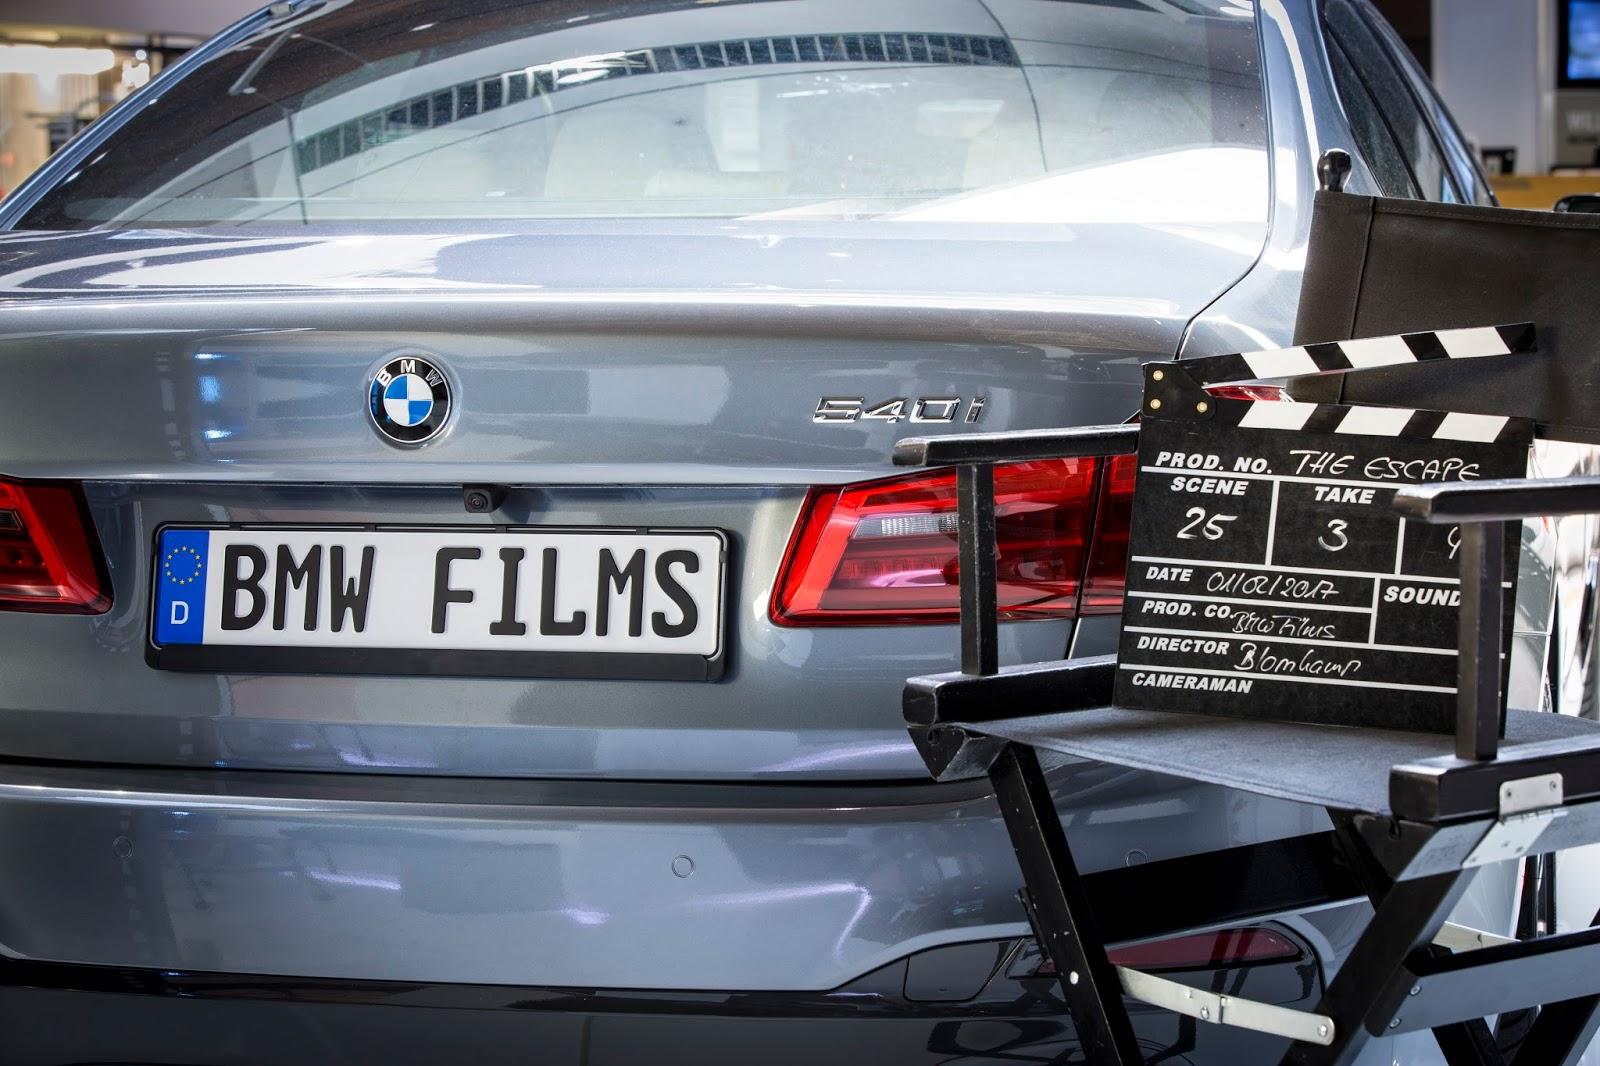 P90248627 highRes the new bmw 5 series Δες την ταινία The Escape, με πρωταγωνιστή την νέα BMW Σειρά 5 BMW, BMW 5, Fun, movie, movie cars, videos, Λανσάρισμα